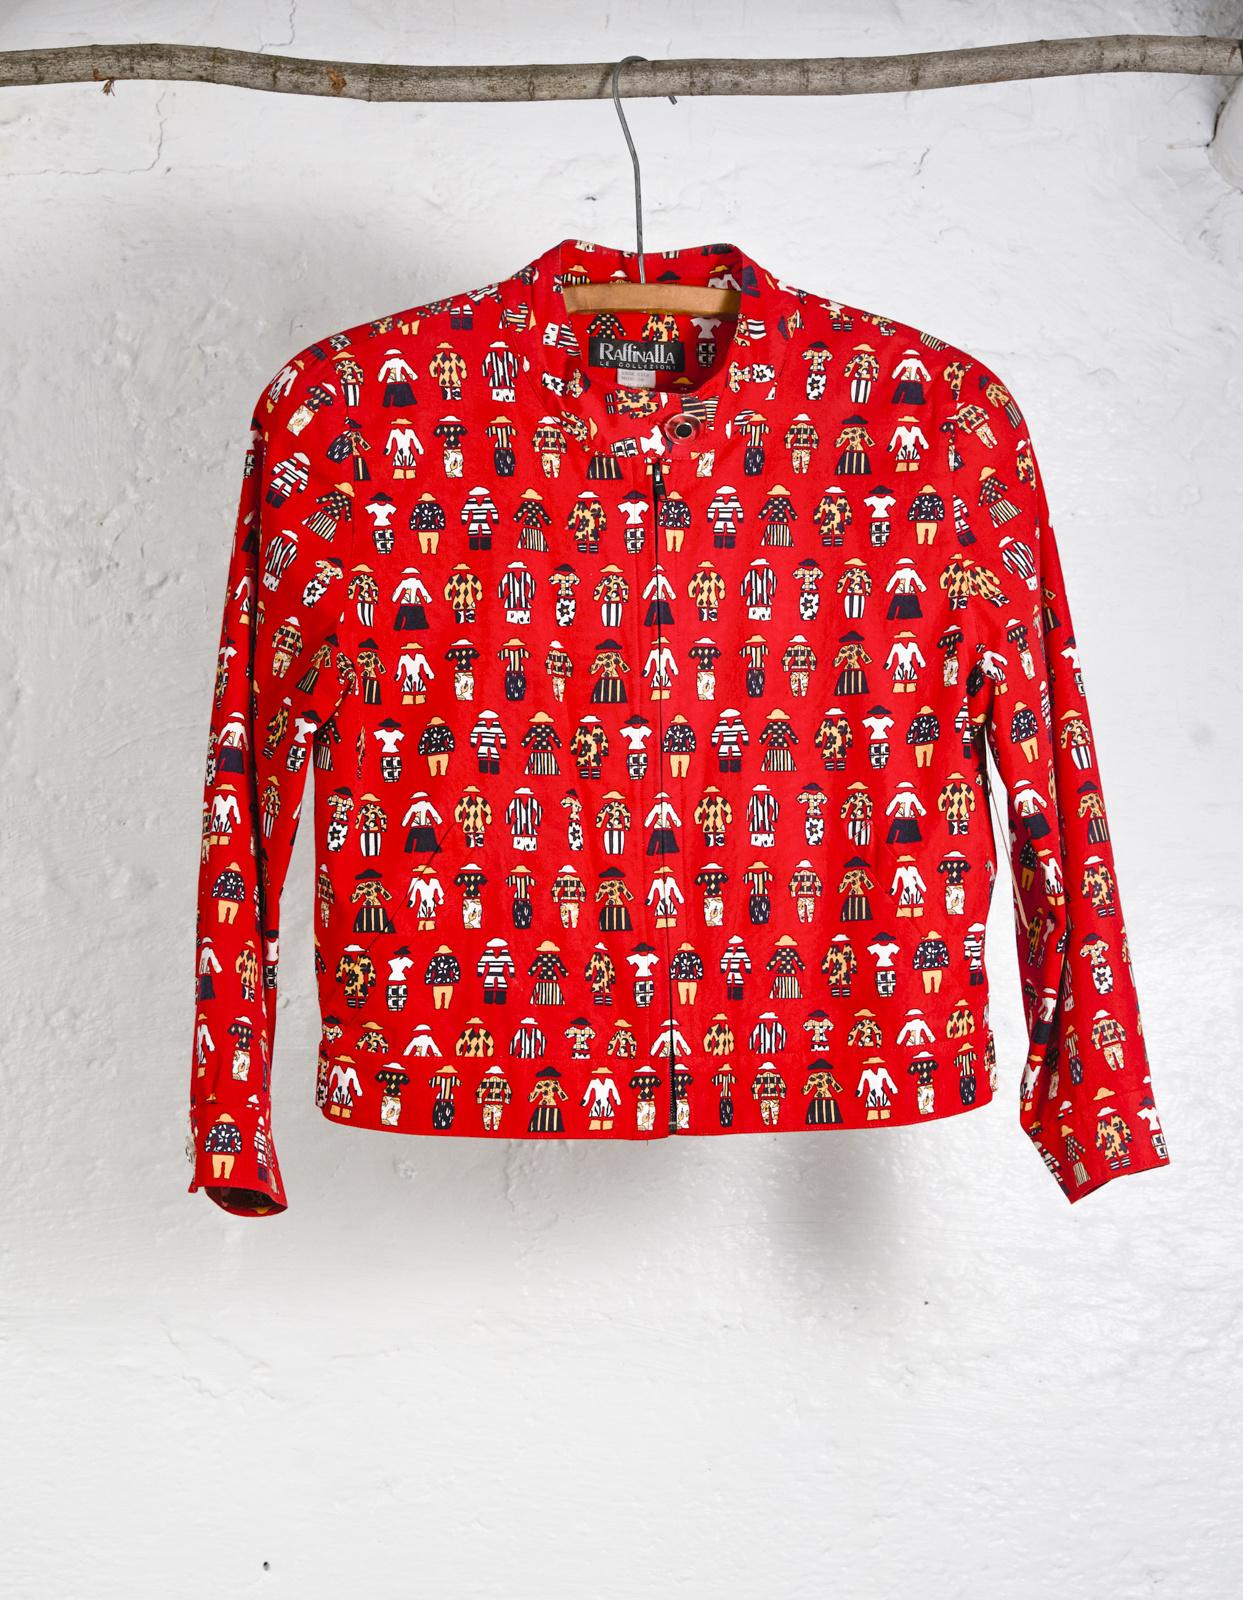 Red Fashion Print Short Jacket